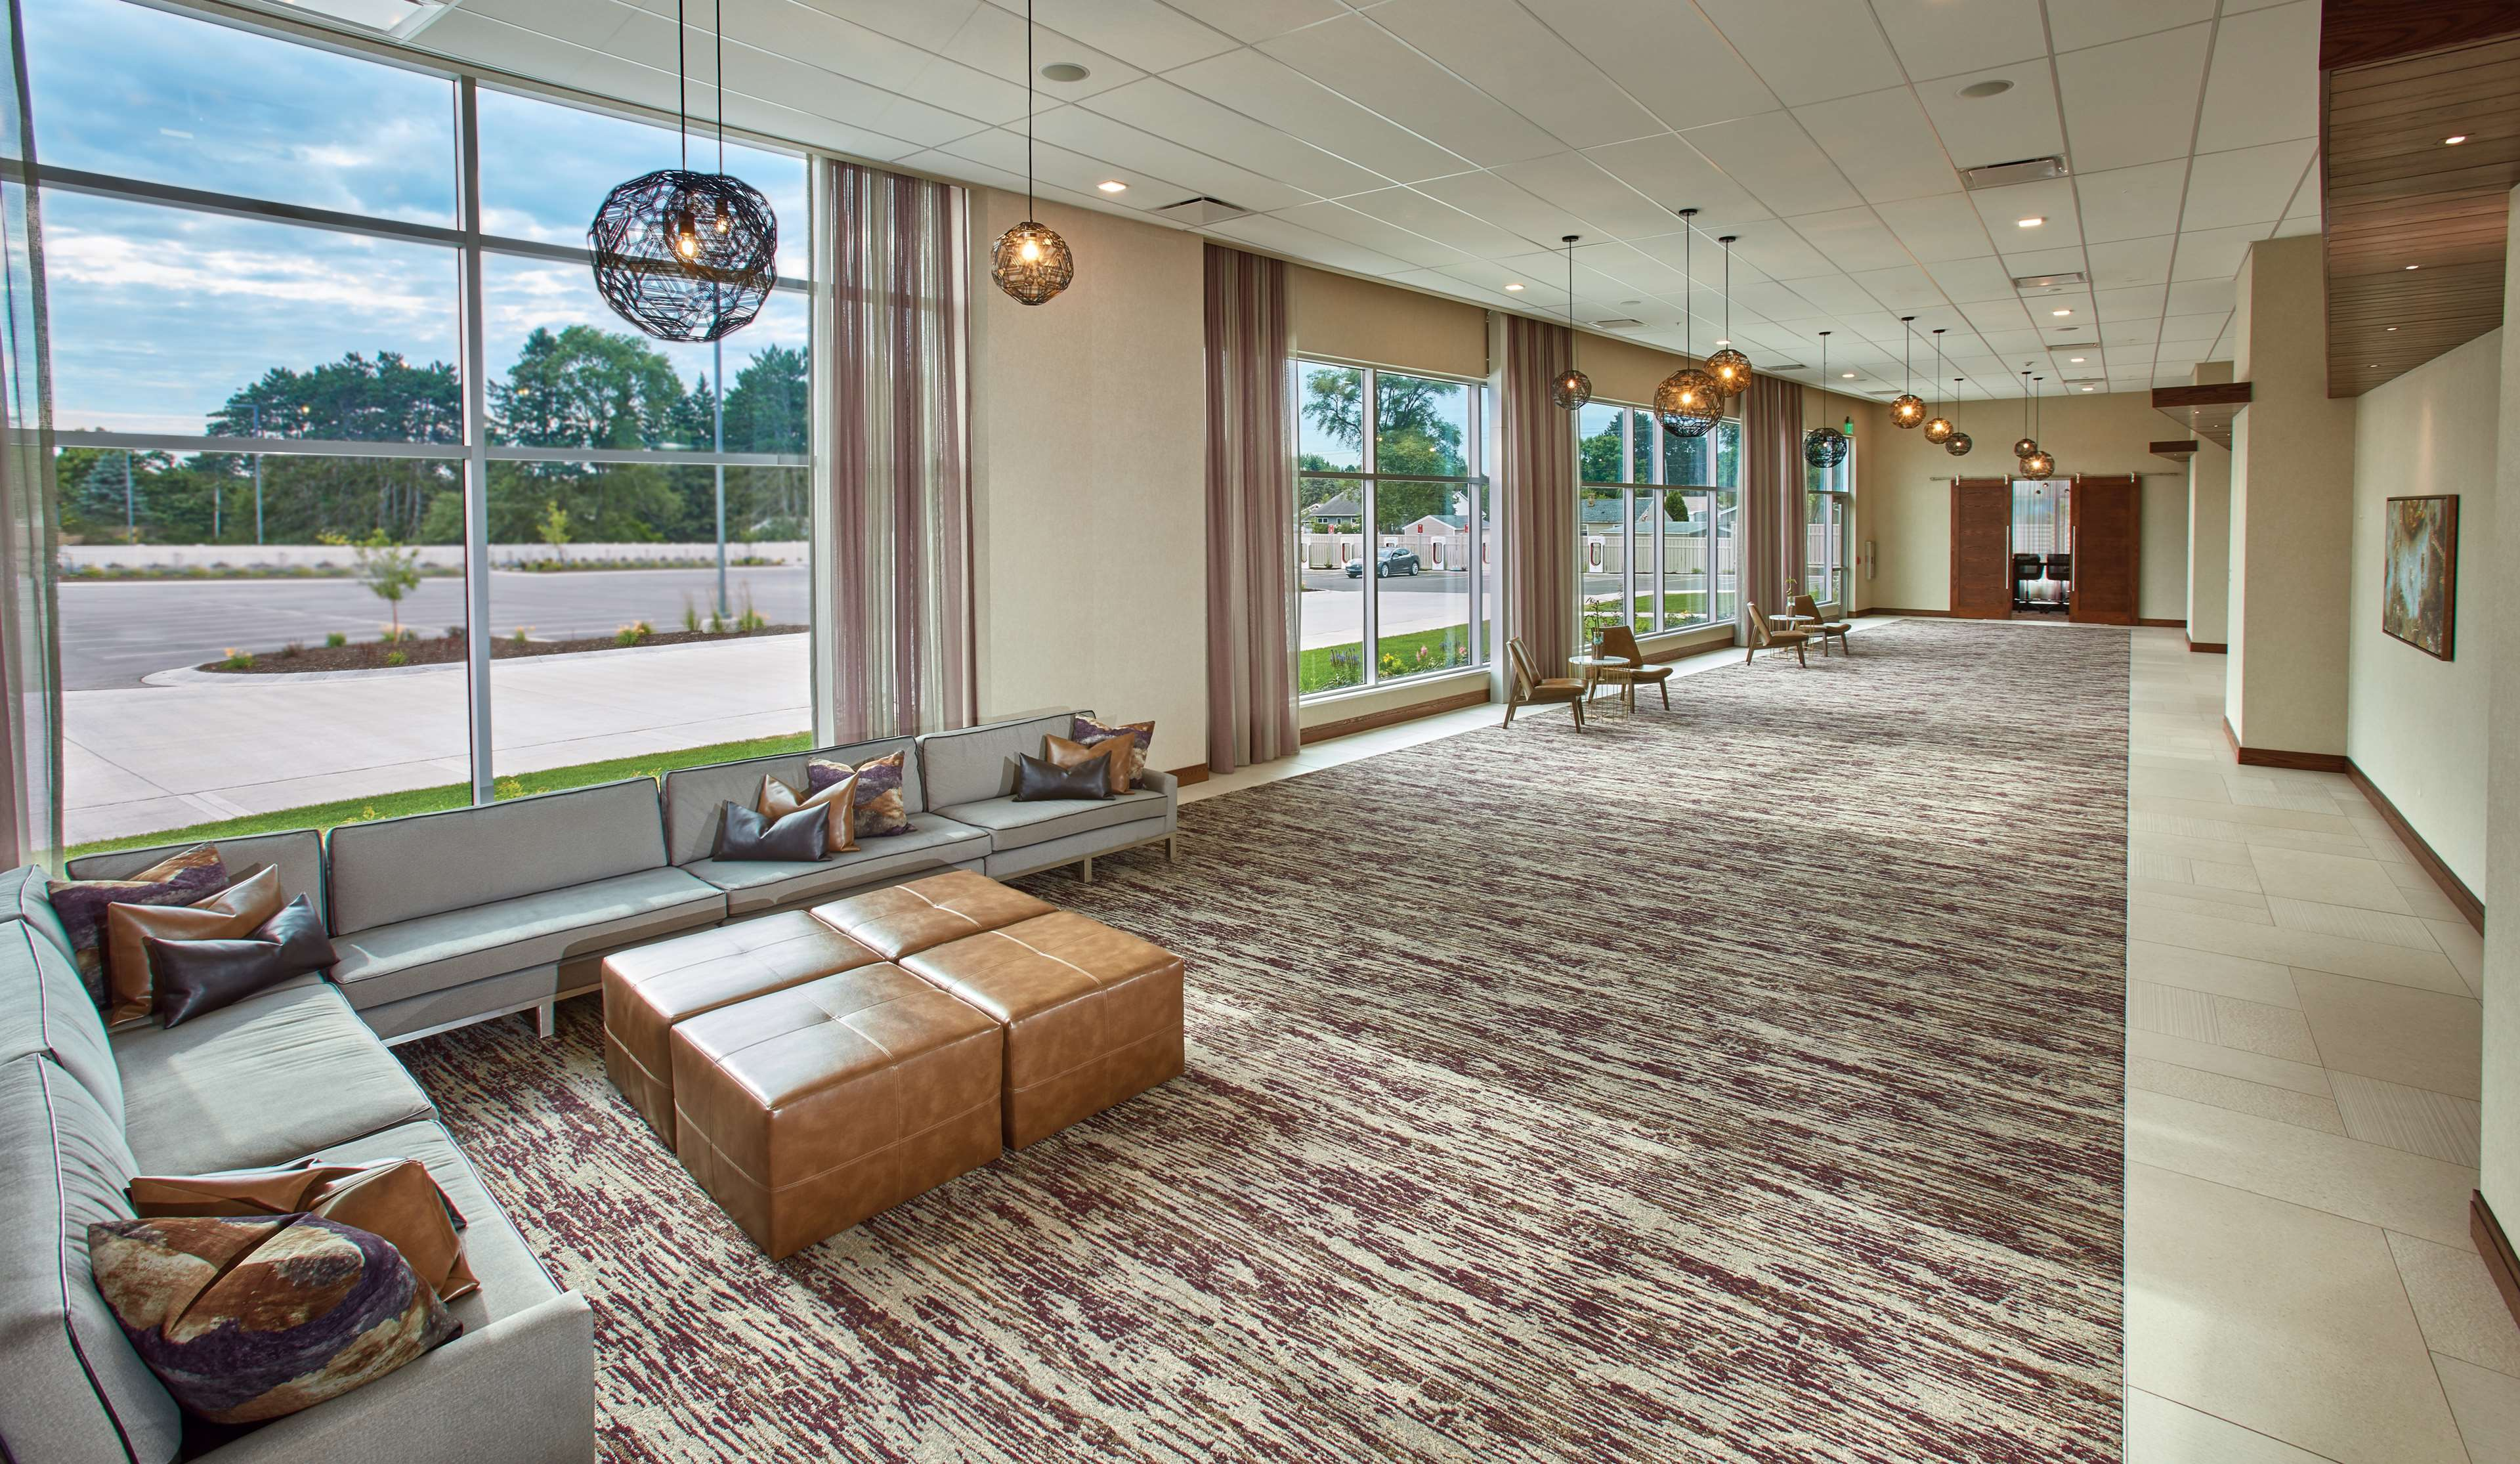 Hilton Garden Inn Wausau image 22